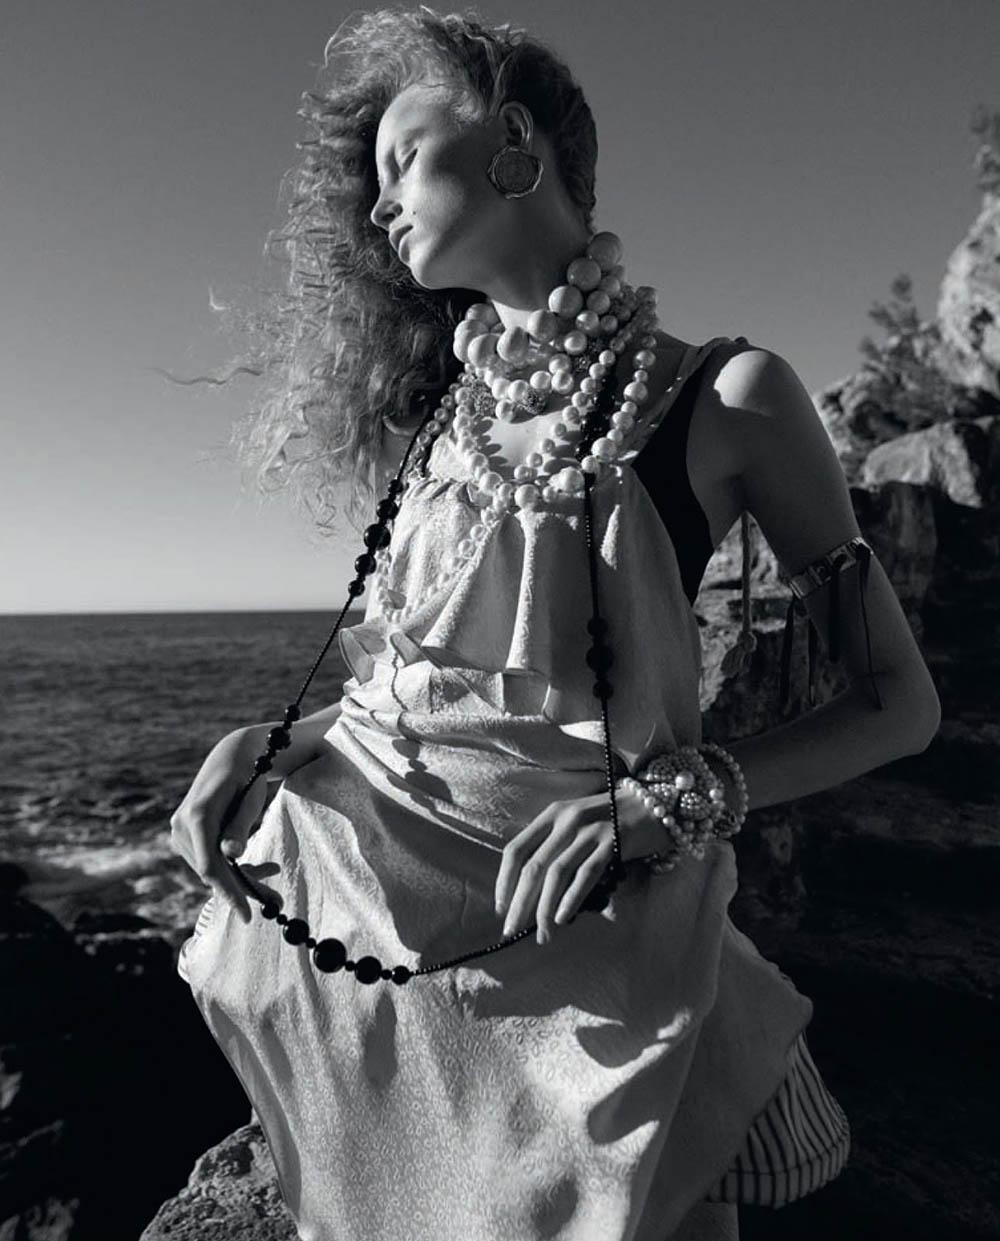 Rianne van Rompaey covers Vogue Italia April 2019 by Karim Sadli